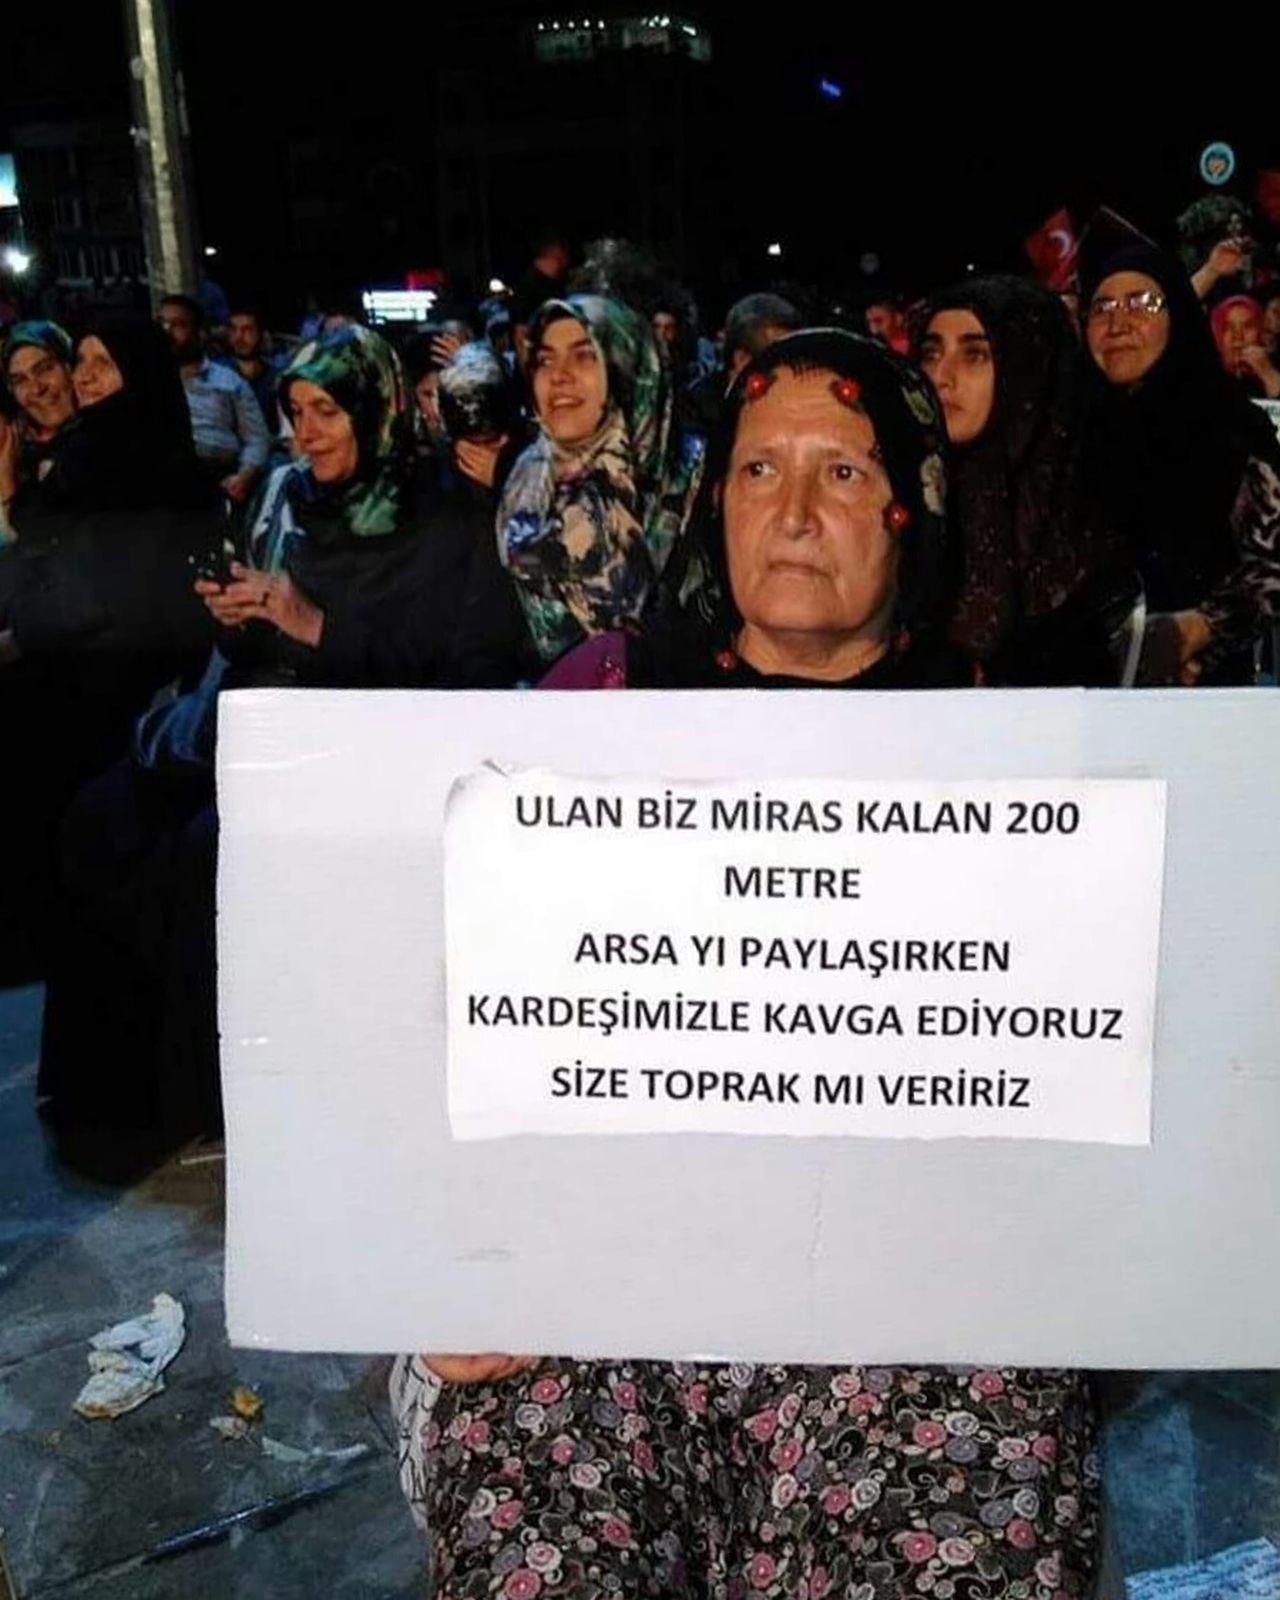 Darbebizesokmez Darbeyehayır Hanging Out Check This Out Izmir Turkey Love♥ Black And White Izmir/ Bornova Eye4photography  Hello World Woman EyeEm Gallery